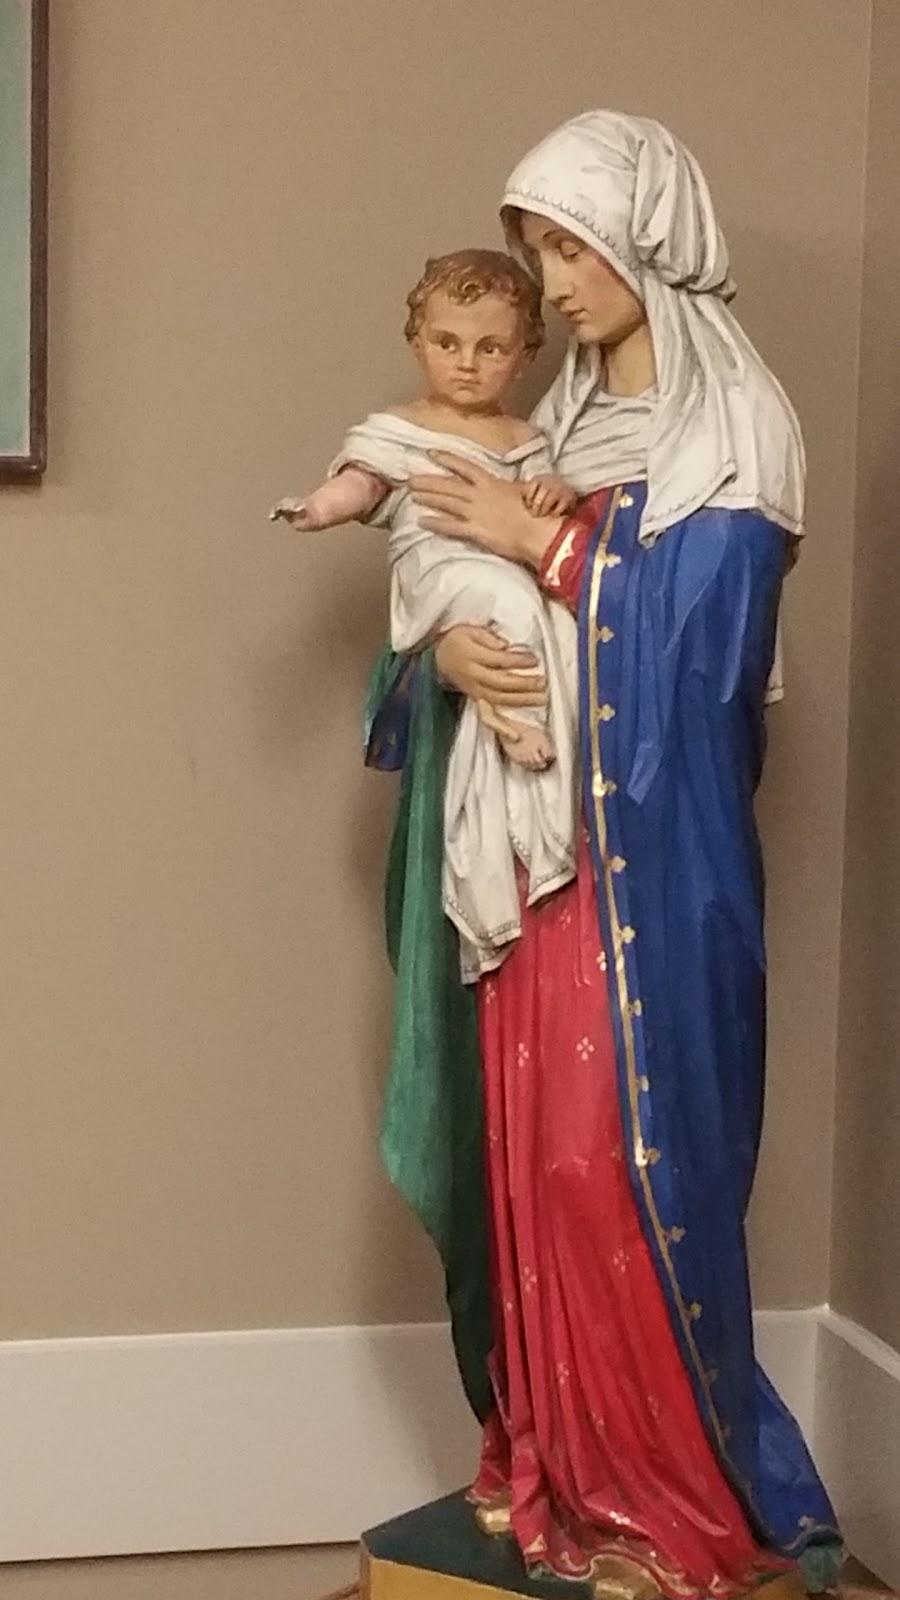 Our Lady of Fatima Church | church | 4635 Elk Lake Dr, Victoria, BC V8Z 5M2, Canada | 2506581587 OR +1 250-658-1587